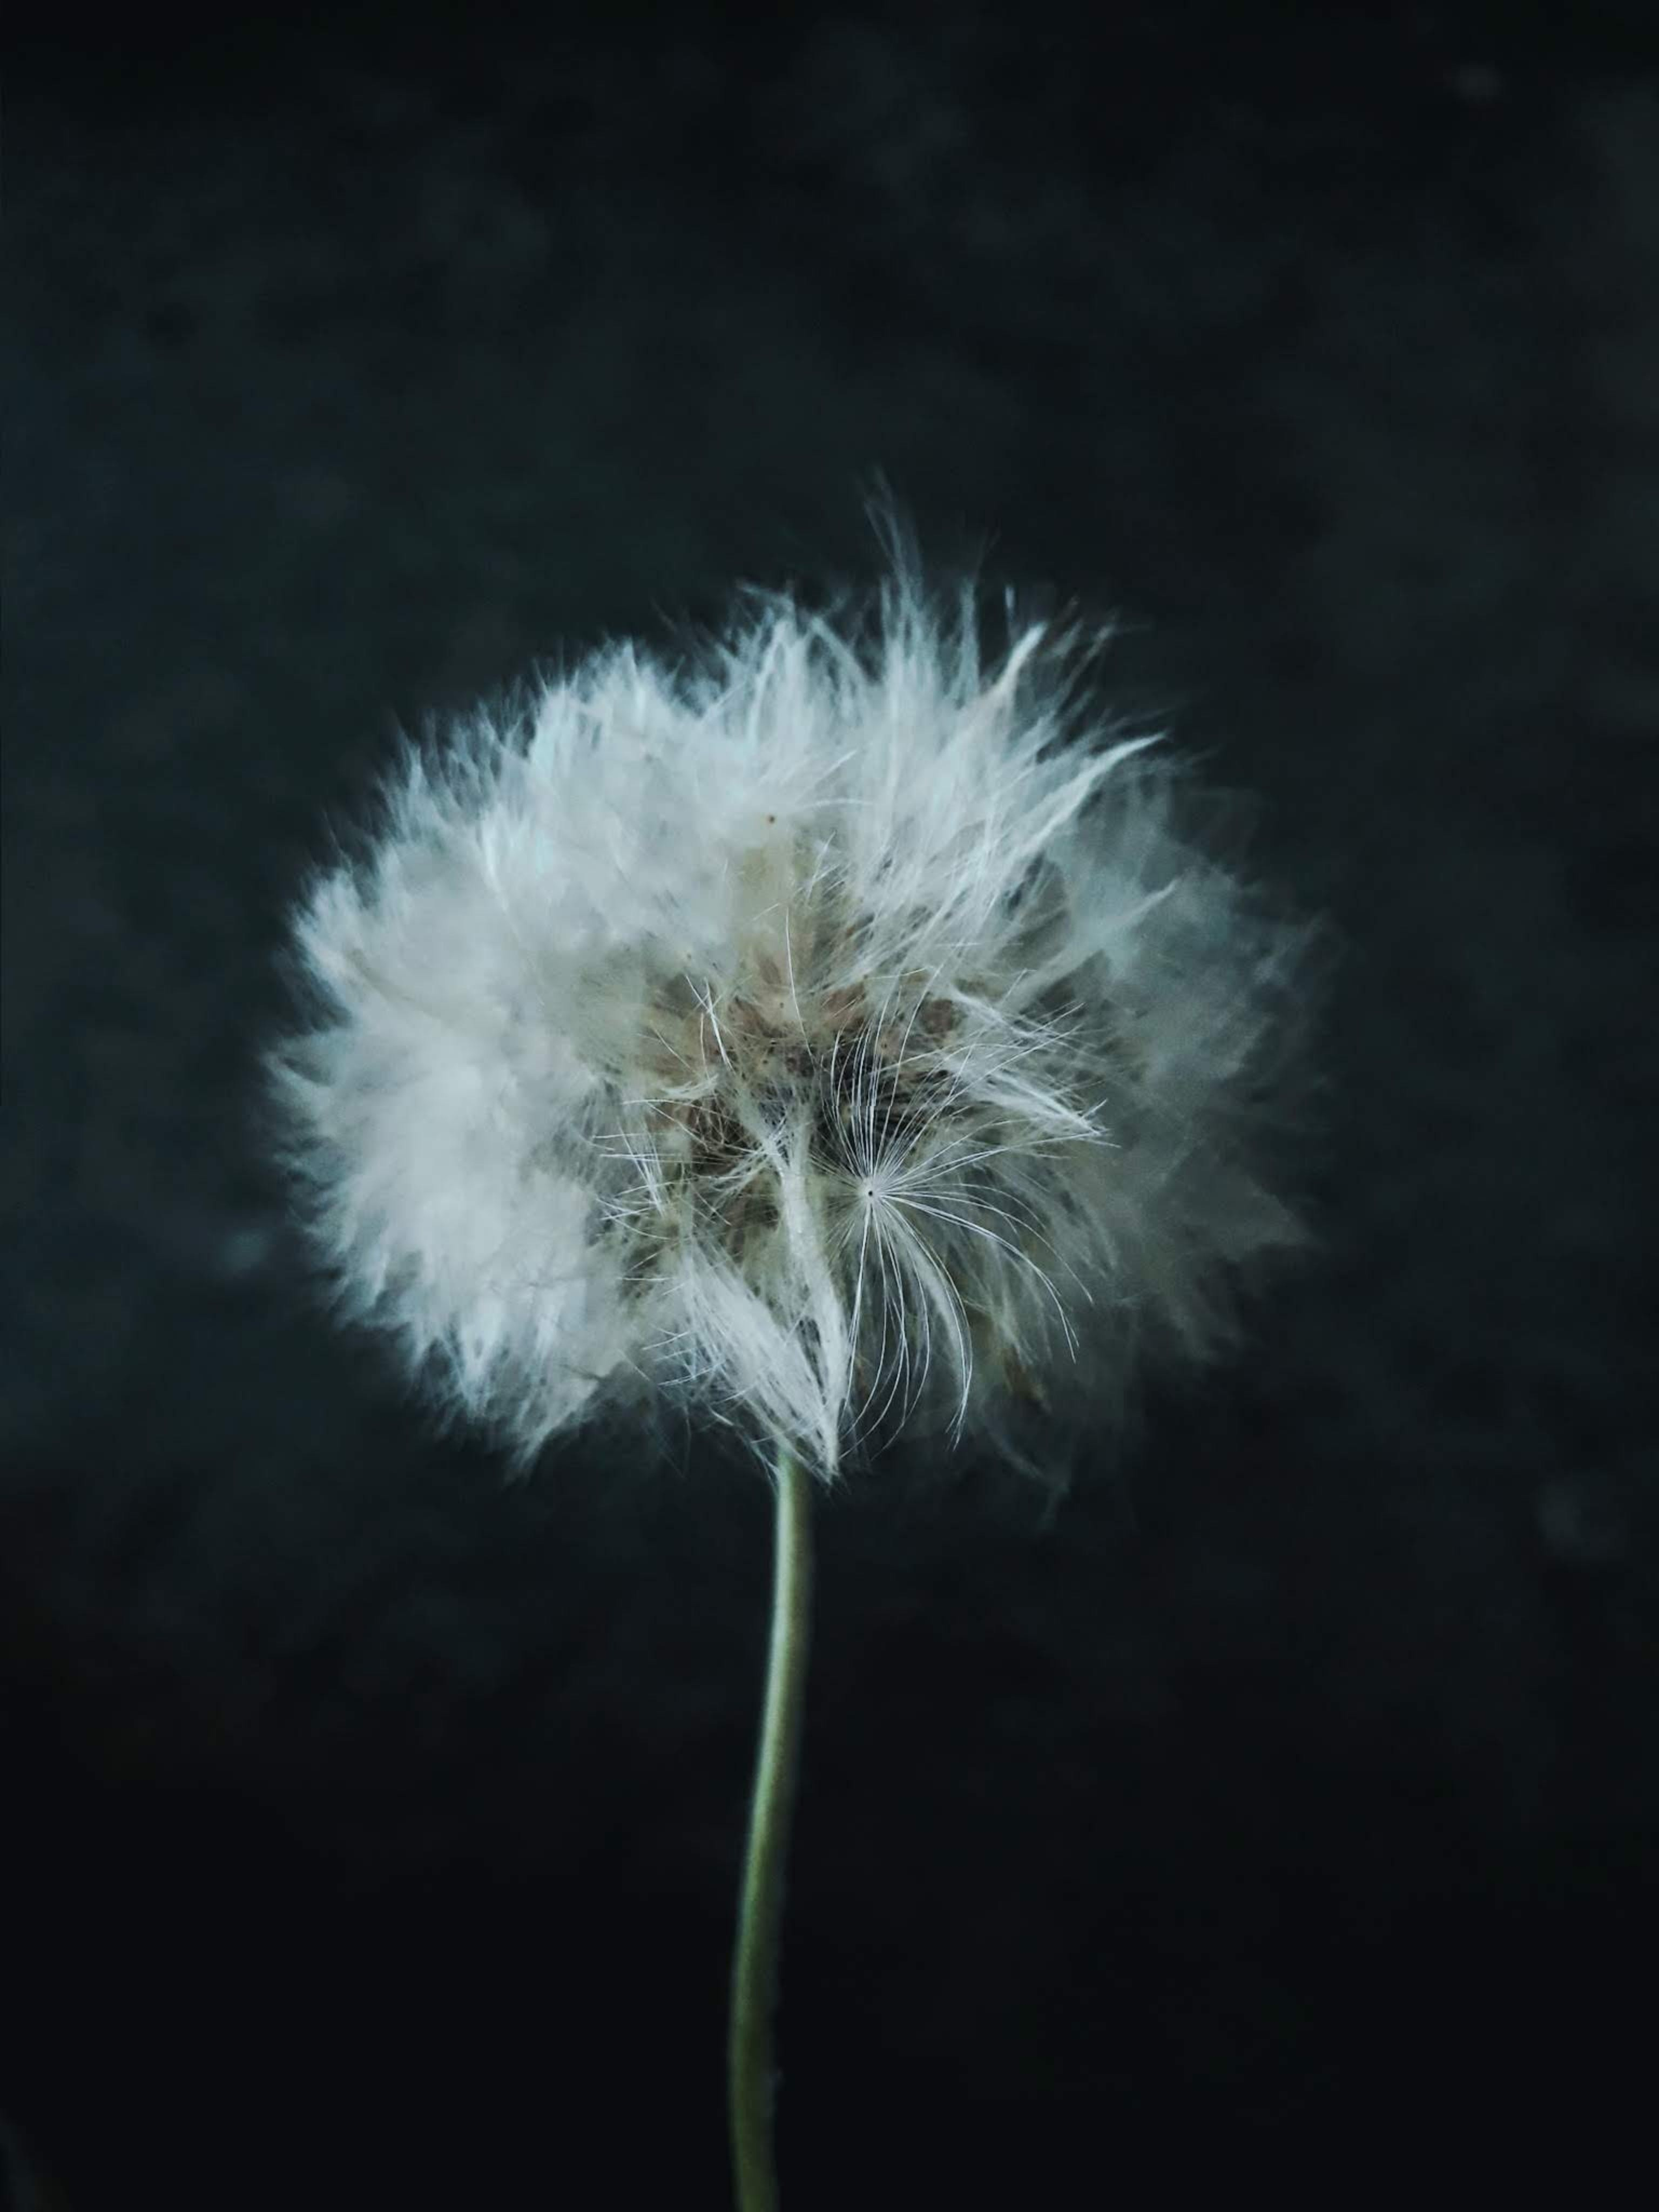 Close-Up Photo of a White Dandelion